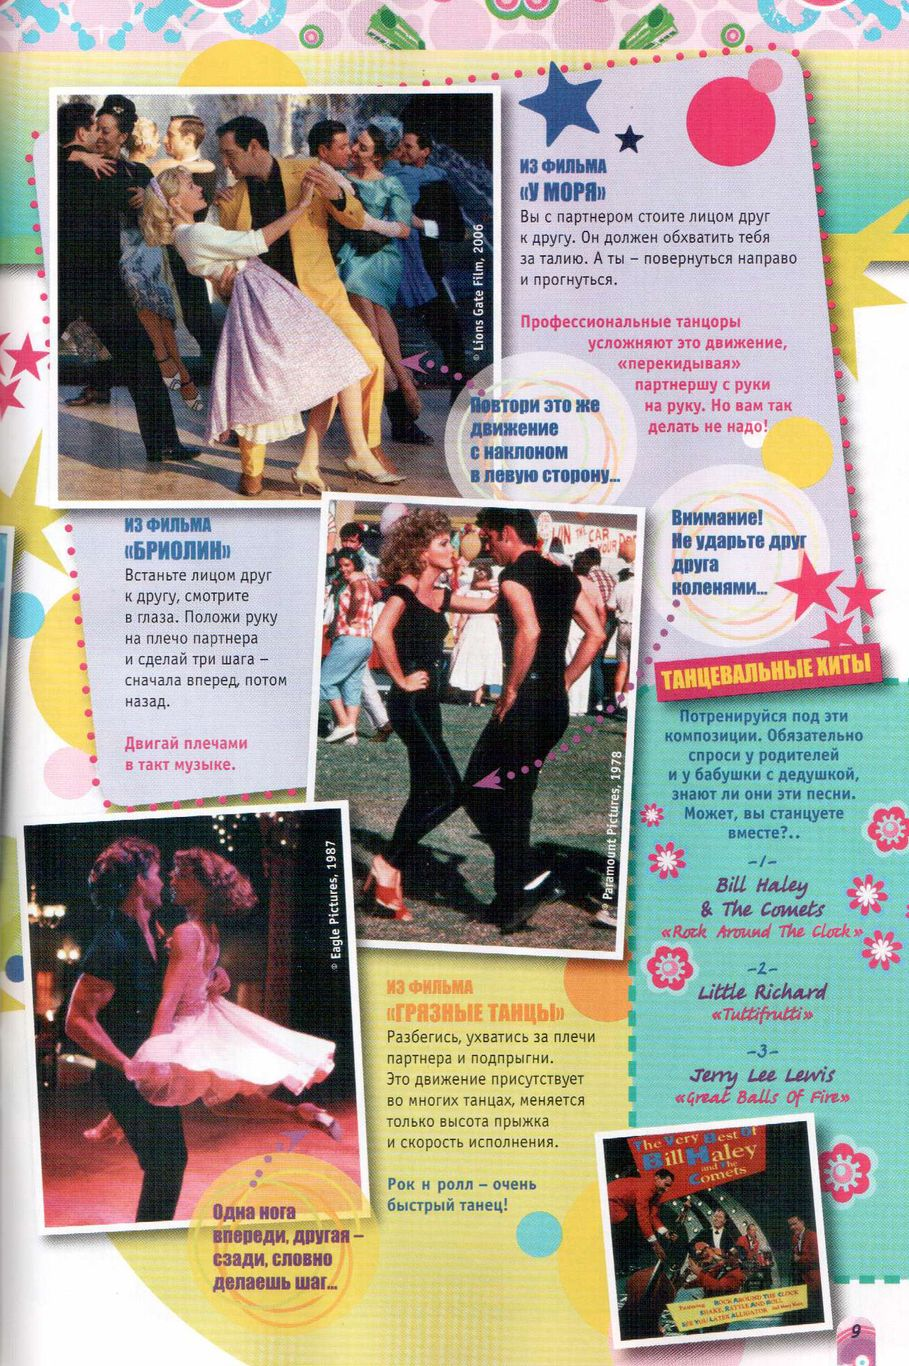 Комикс Винкс Winx - Любовь и ревность (Журнал Винкс №7 2011) - стр. 9